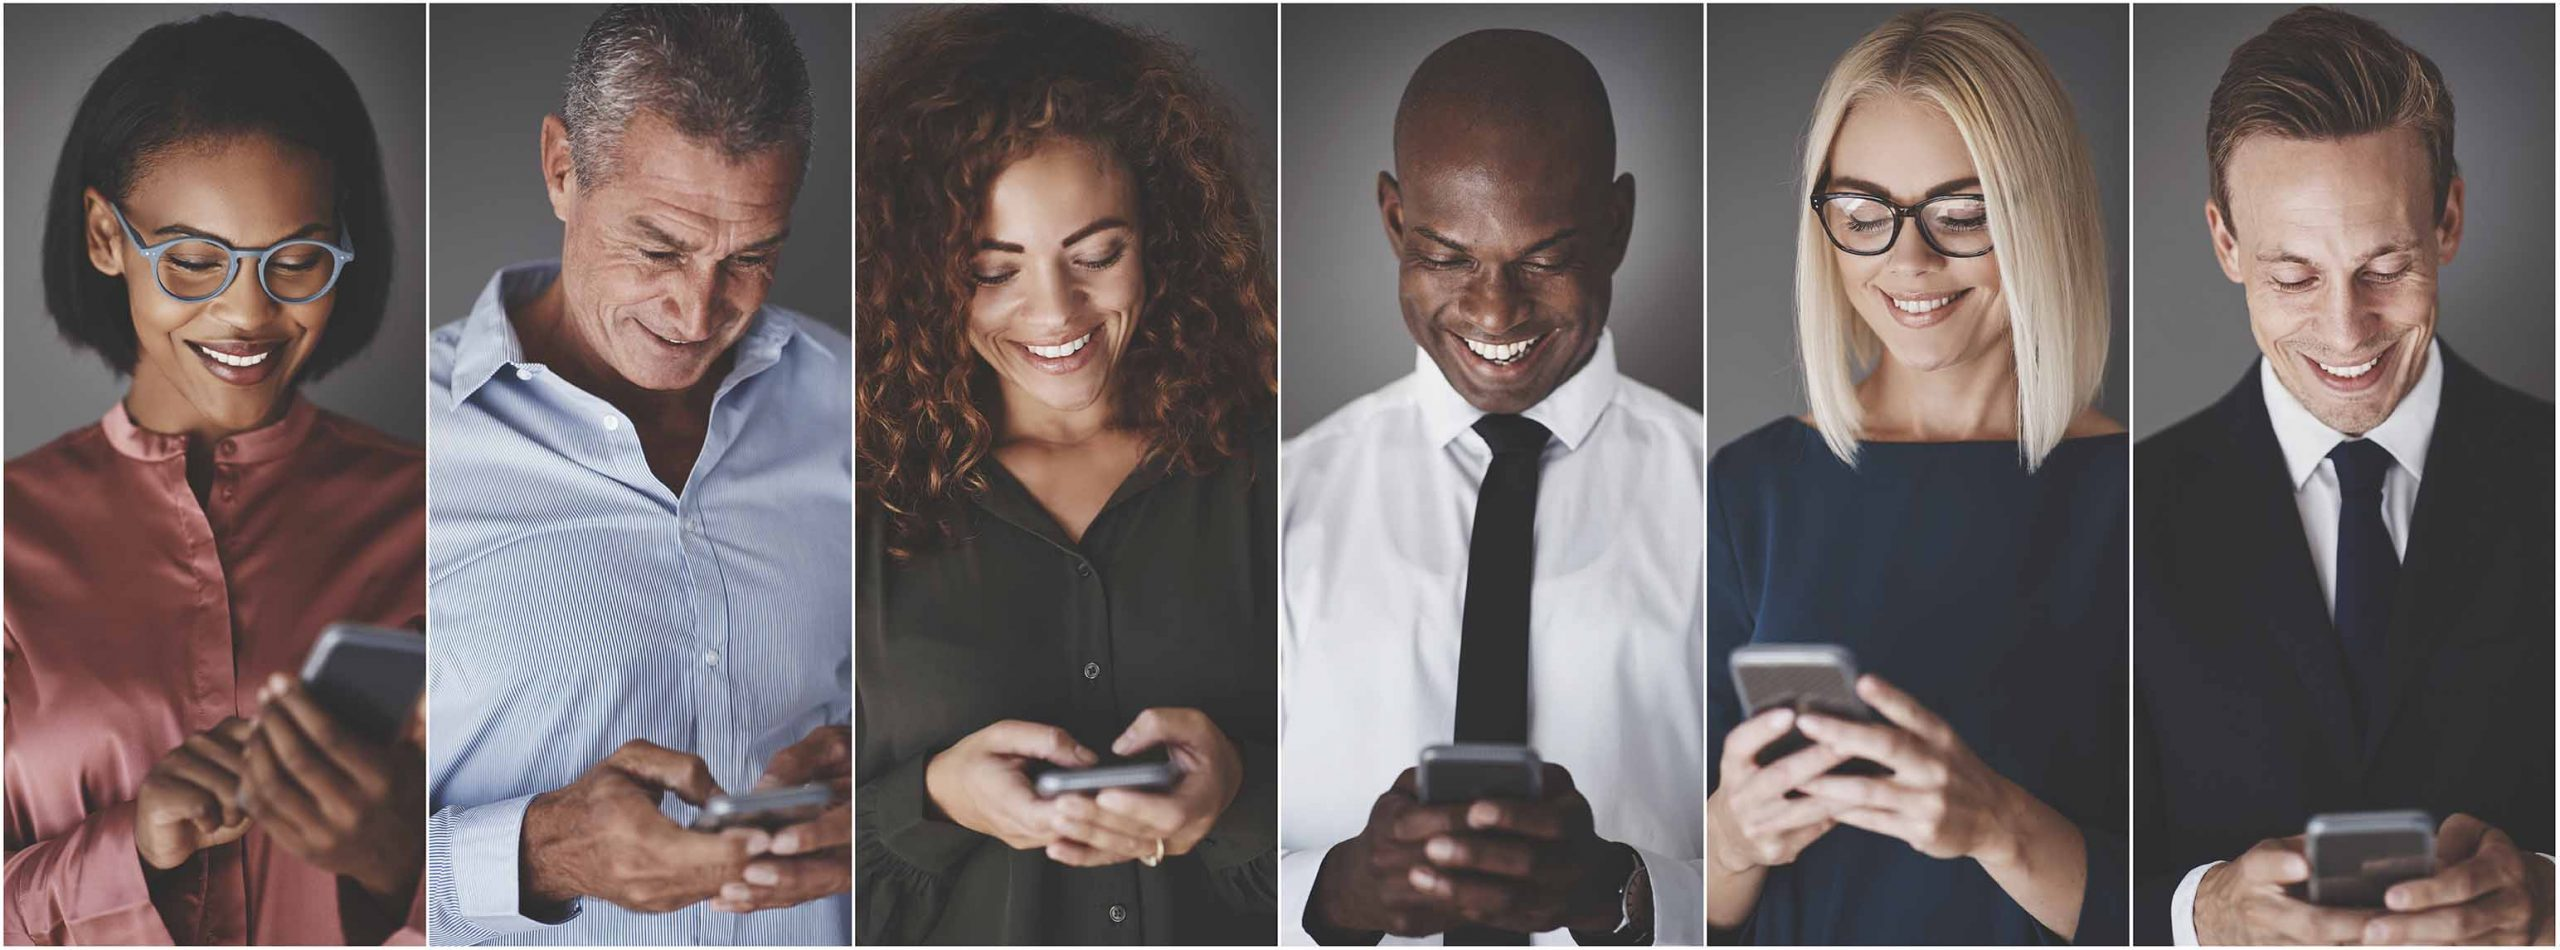 nsurance-Customers-Digital-Channels-Insurance-Personas